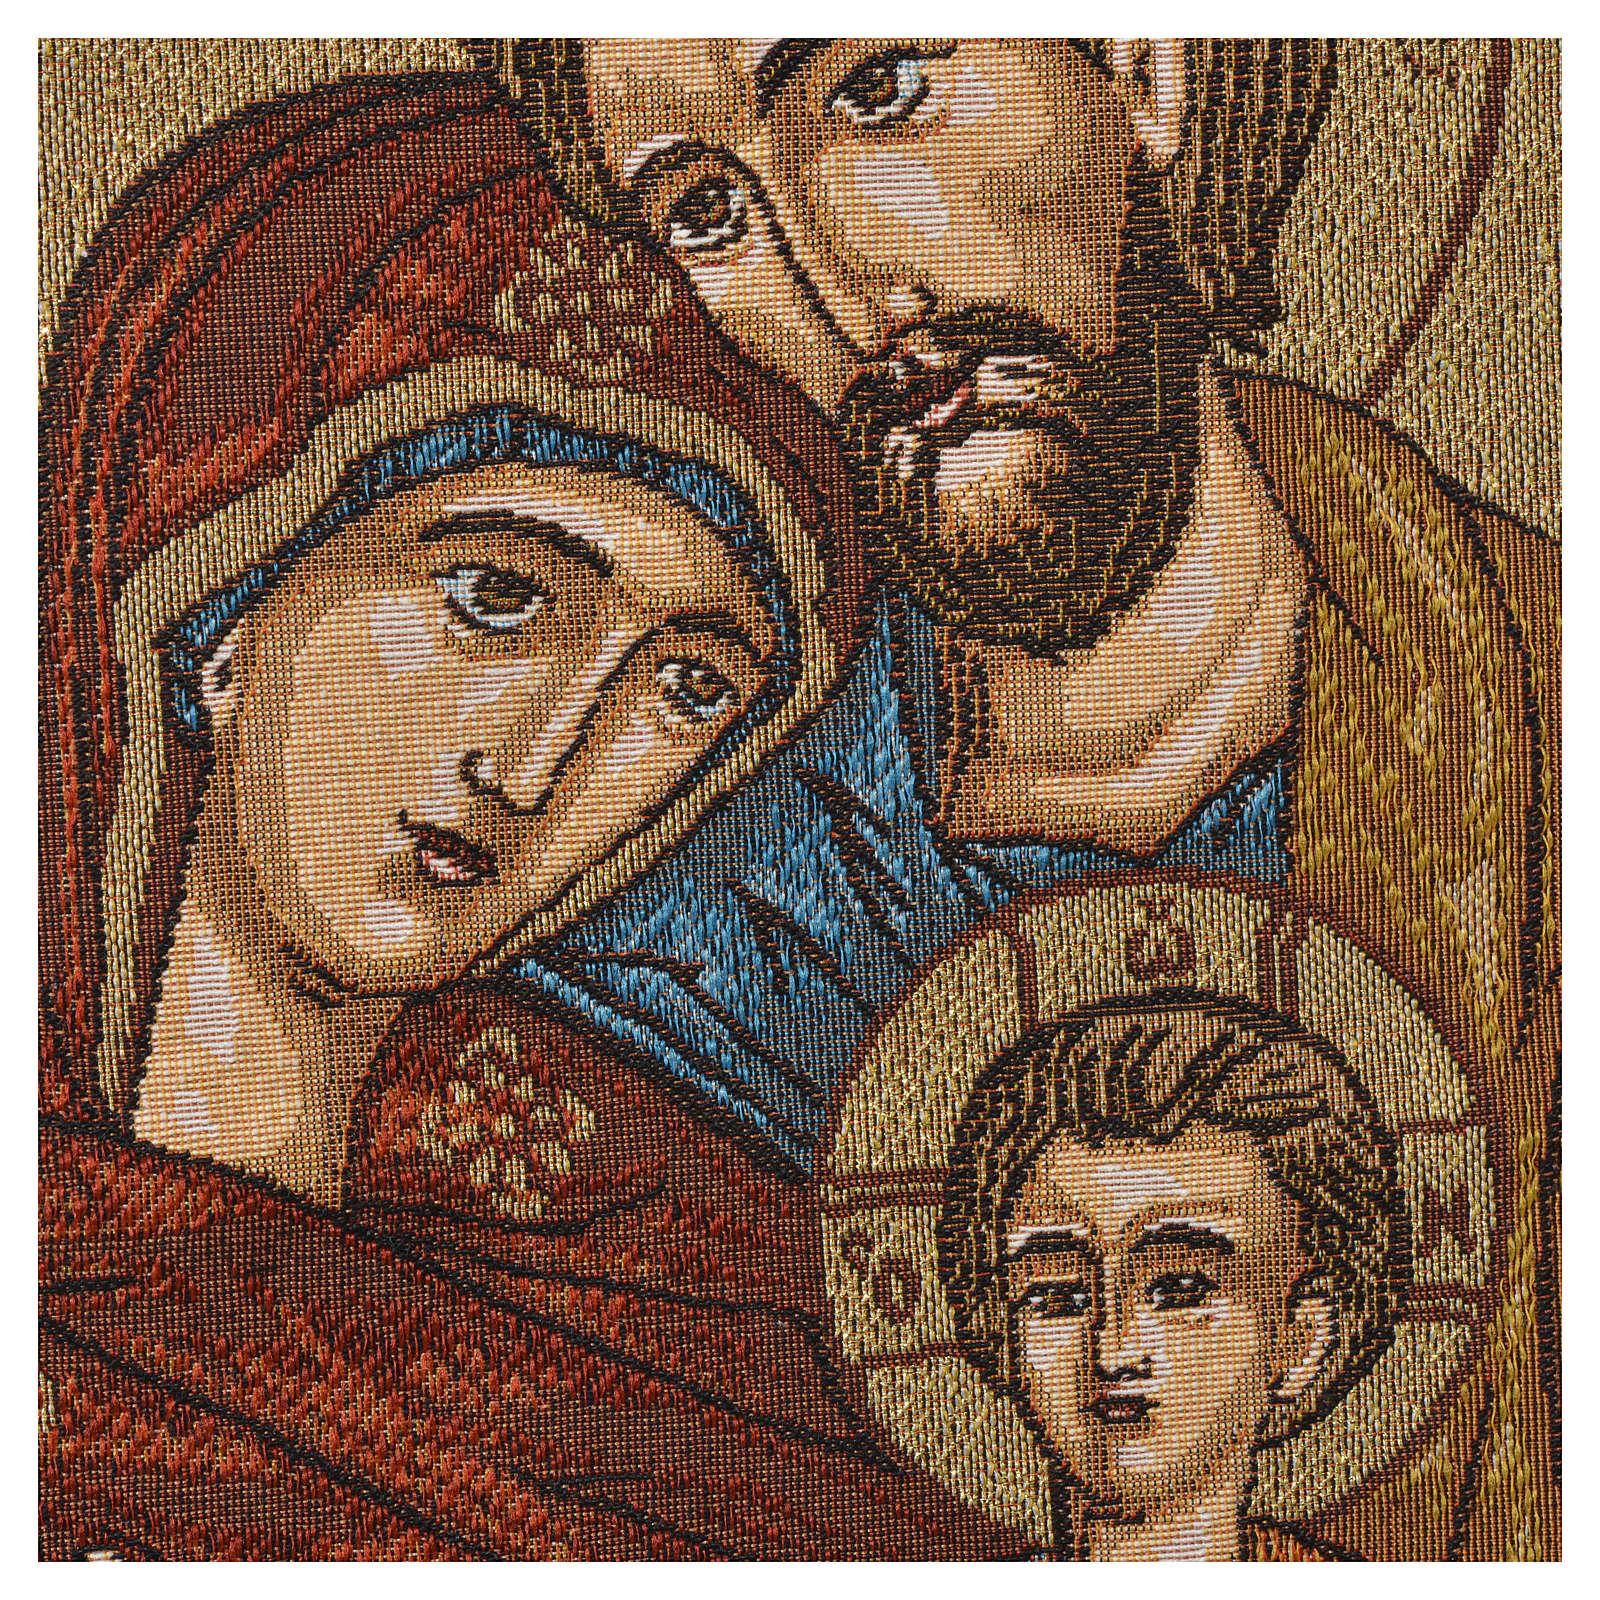 Tapiz con Sagrada Familia 47x34cm 3